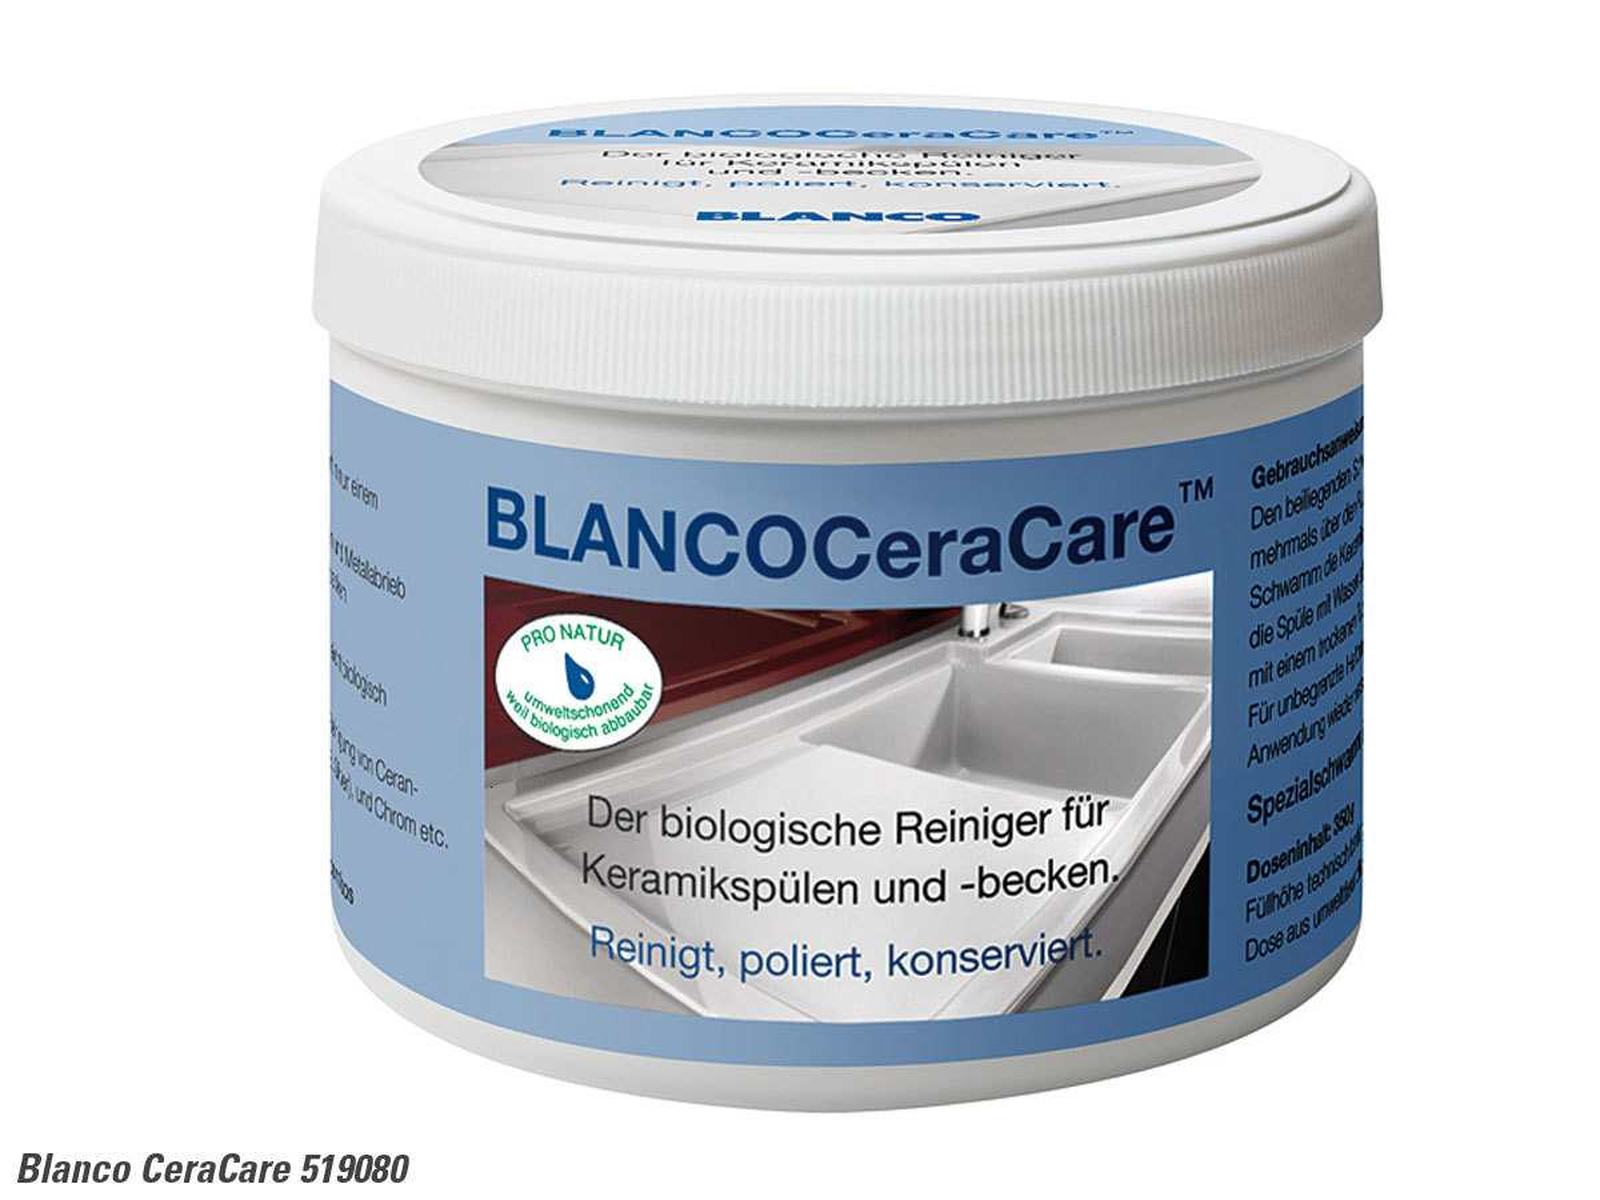 Blanco 519 080 CeraCare